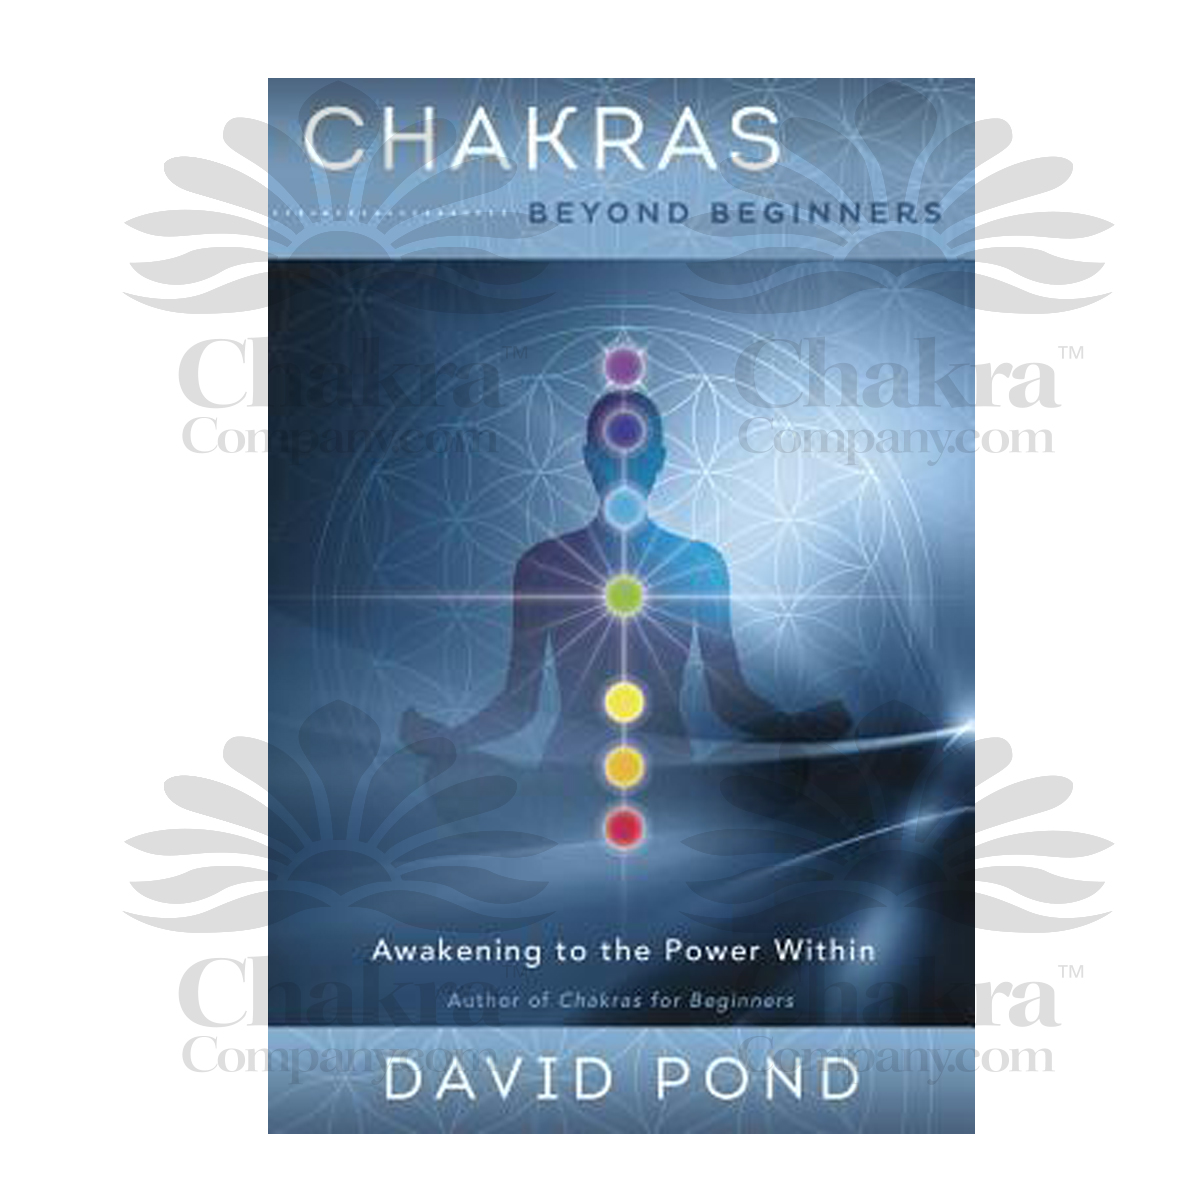 Chakras Beyond Beginners